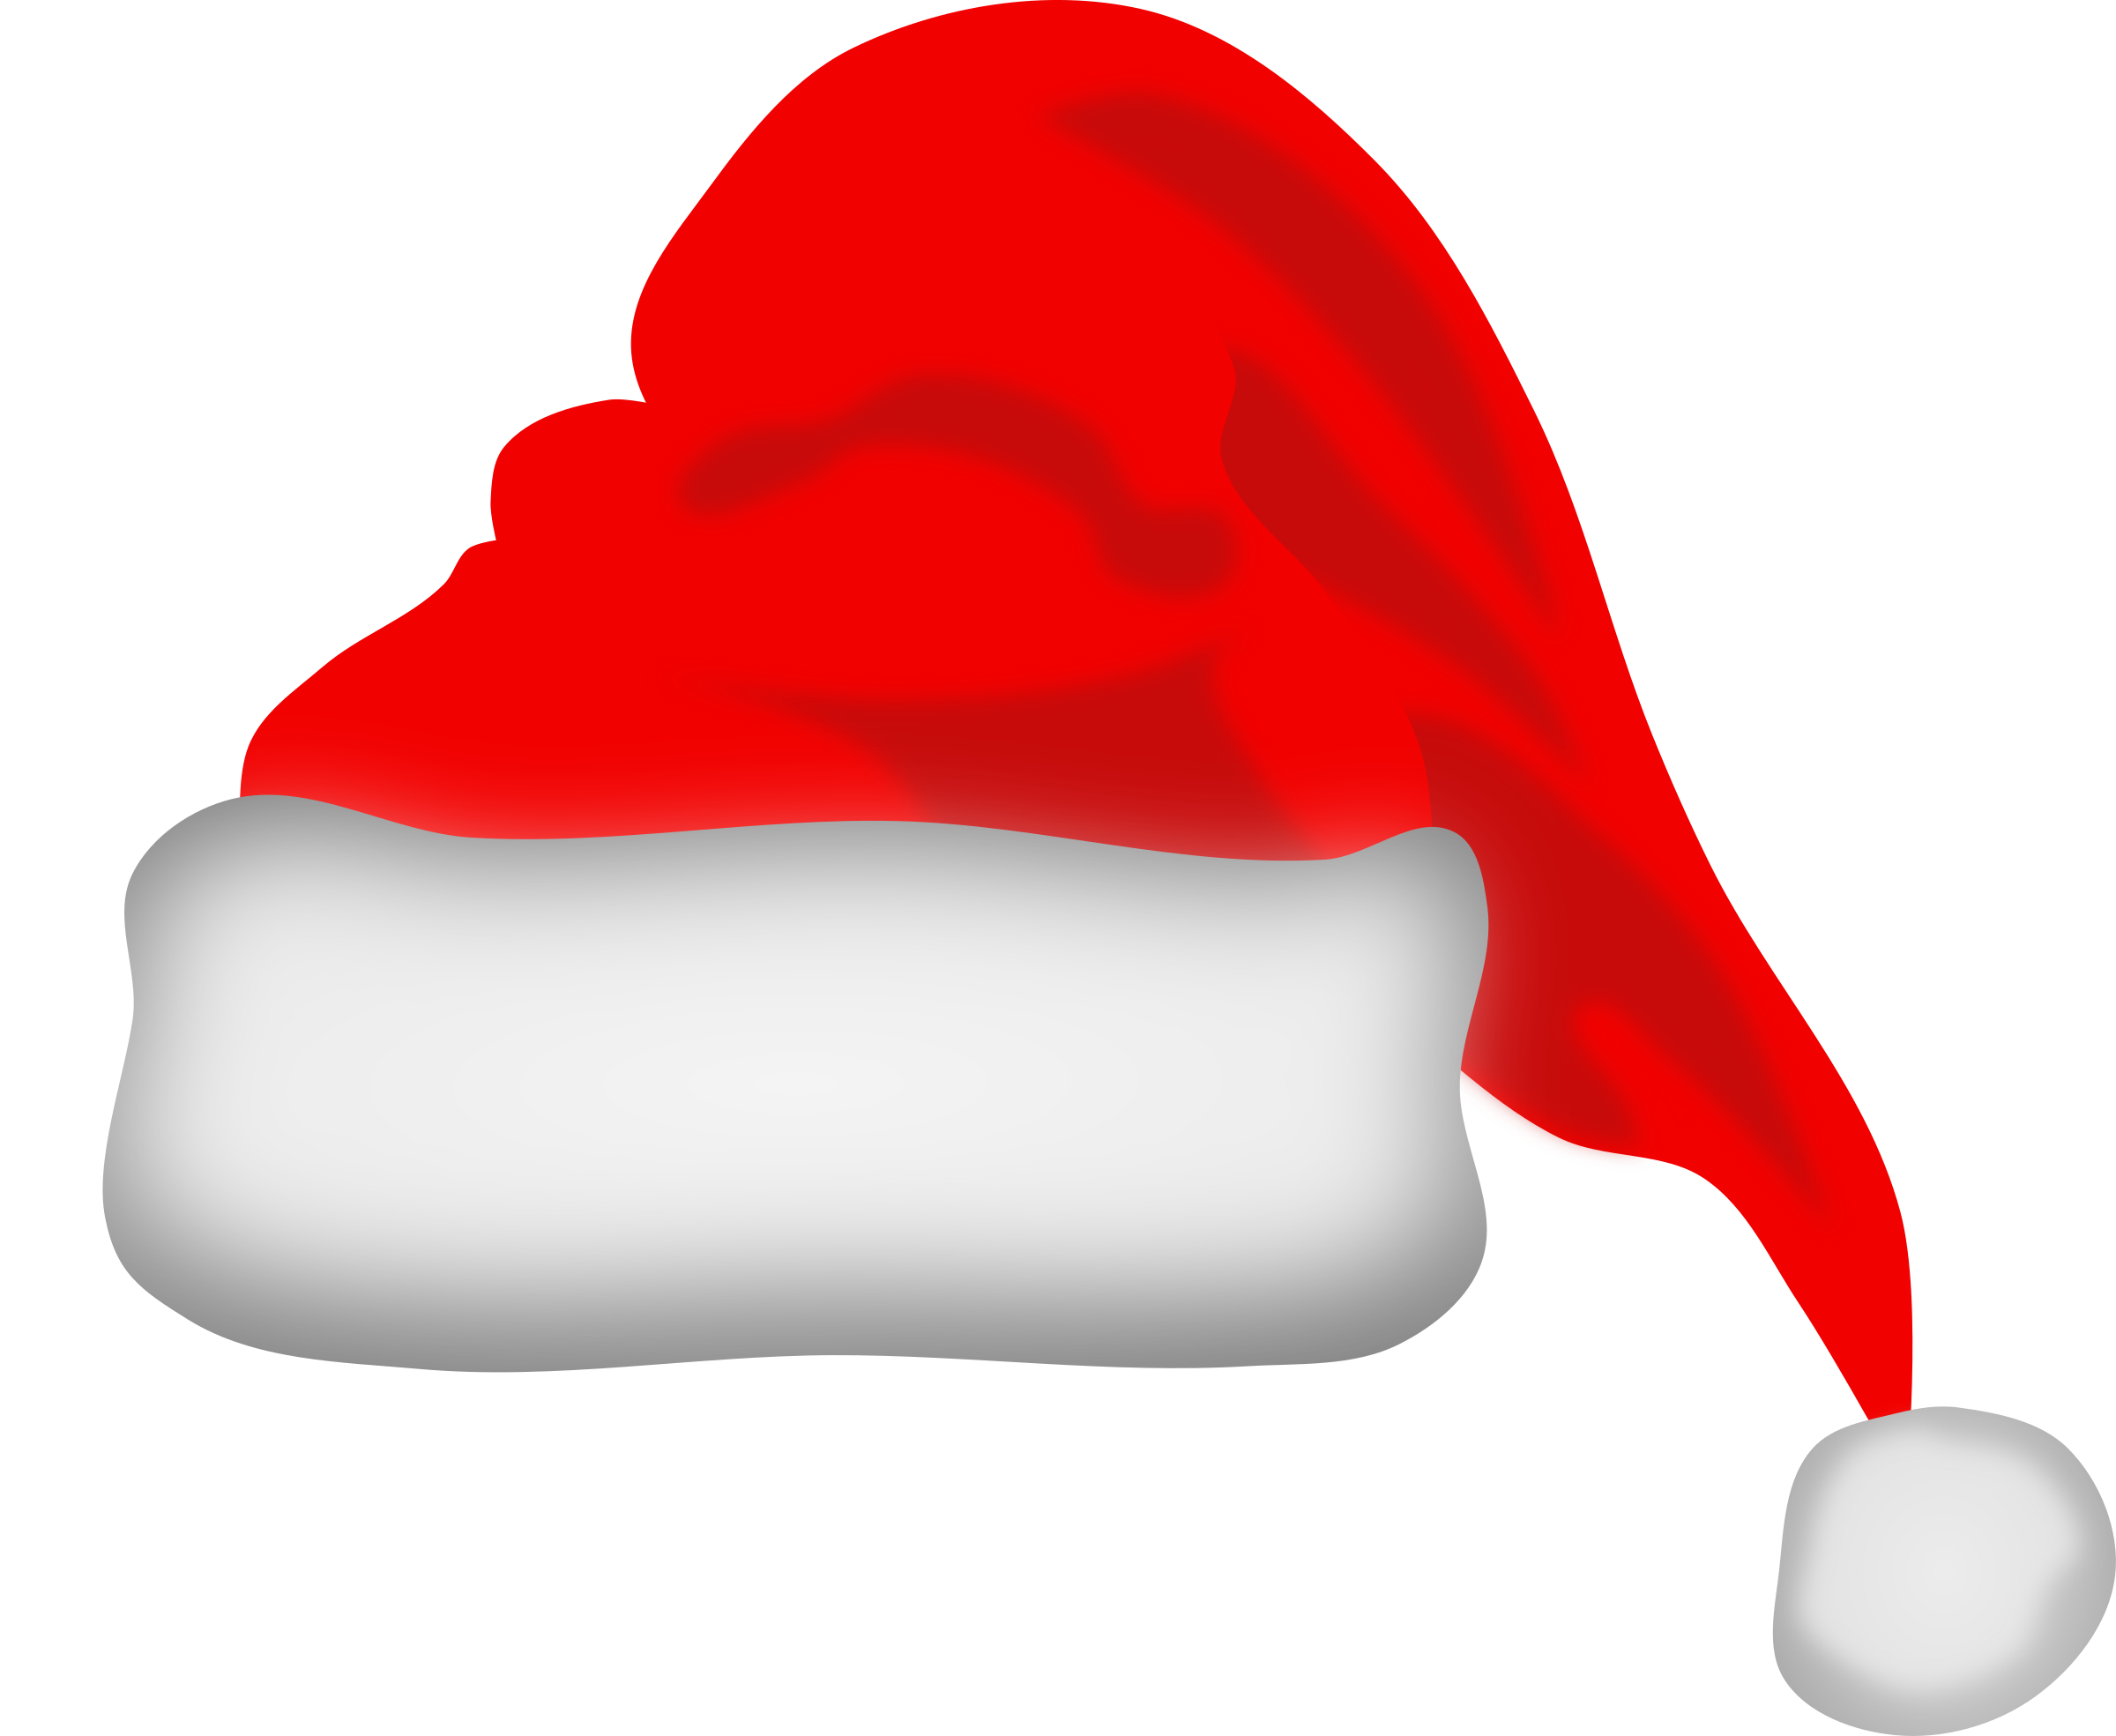 clip art black and white Beard clipart file. Santa claus hat big